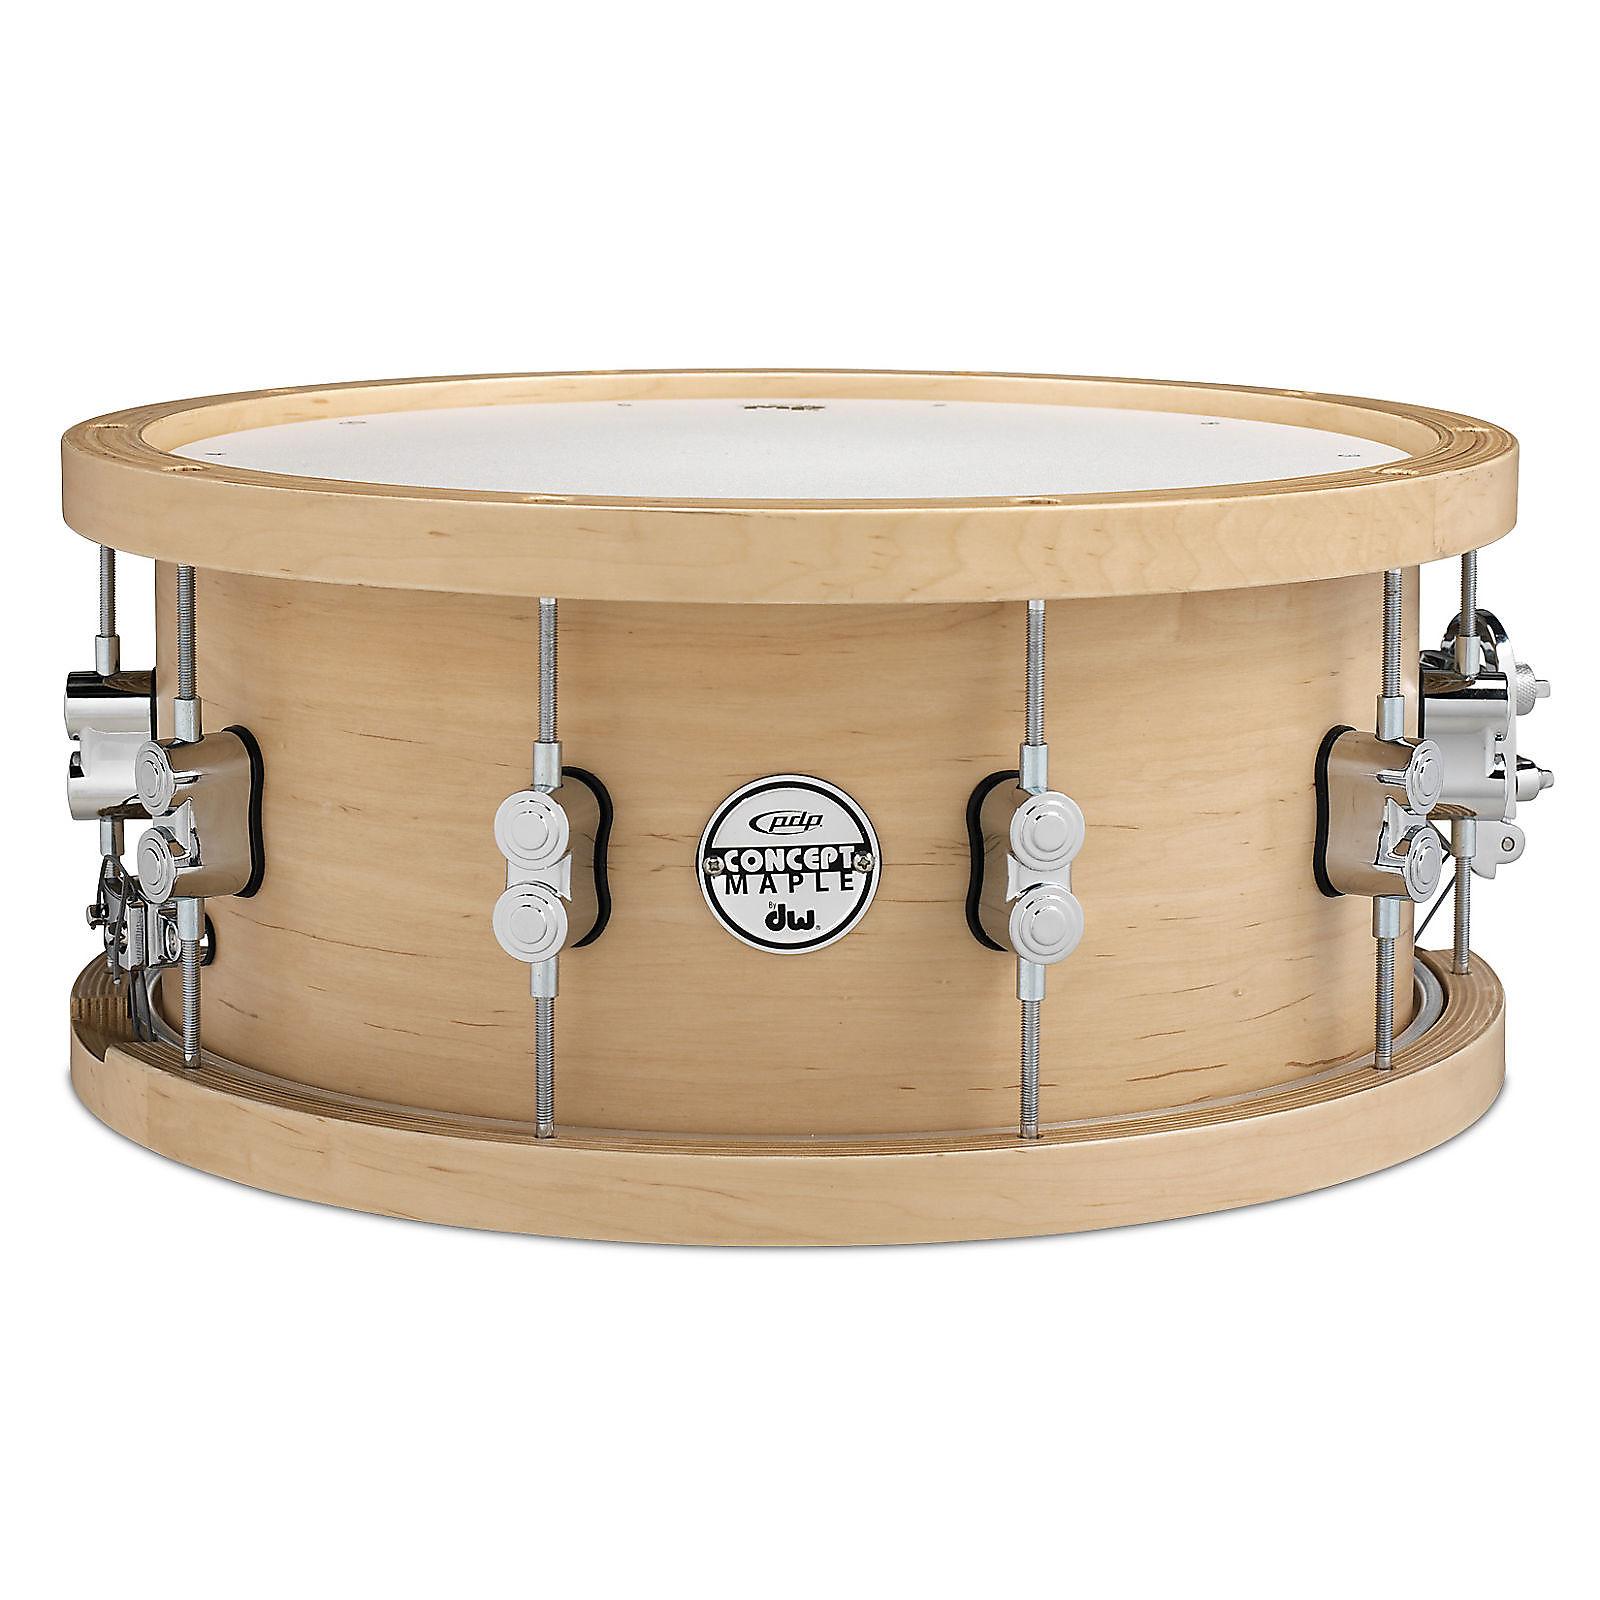 pdp pdsn5514nawh 20 ply maple snare drum w wood hoops reverb. Black Bedroom Furniture Sets. Home Design Ideas